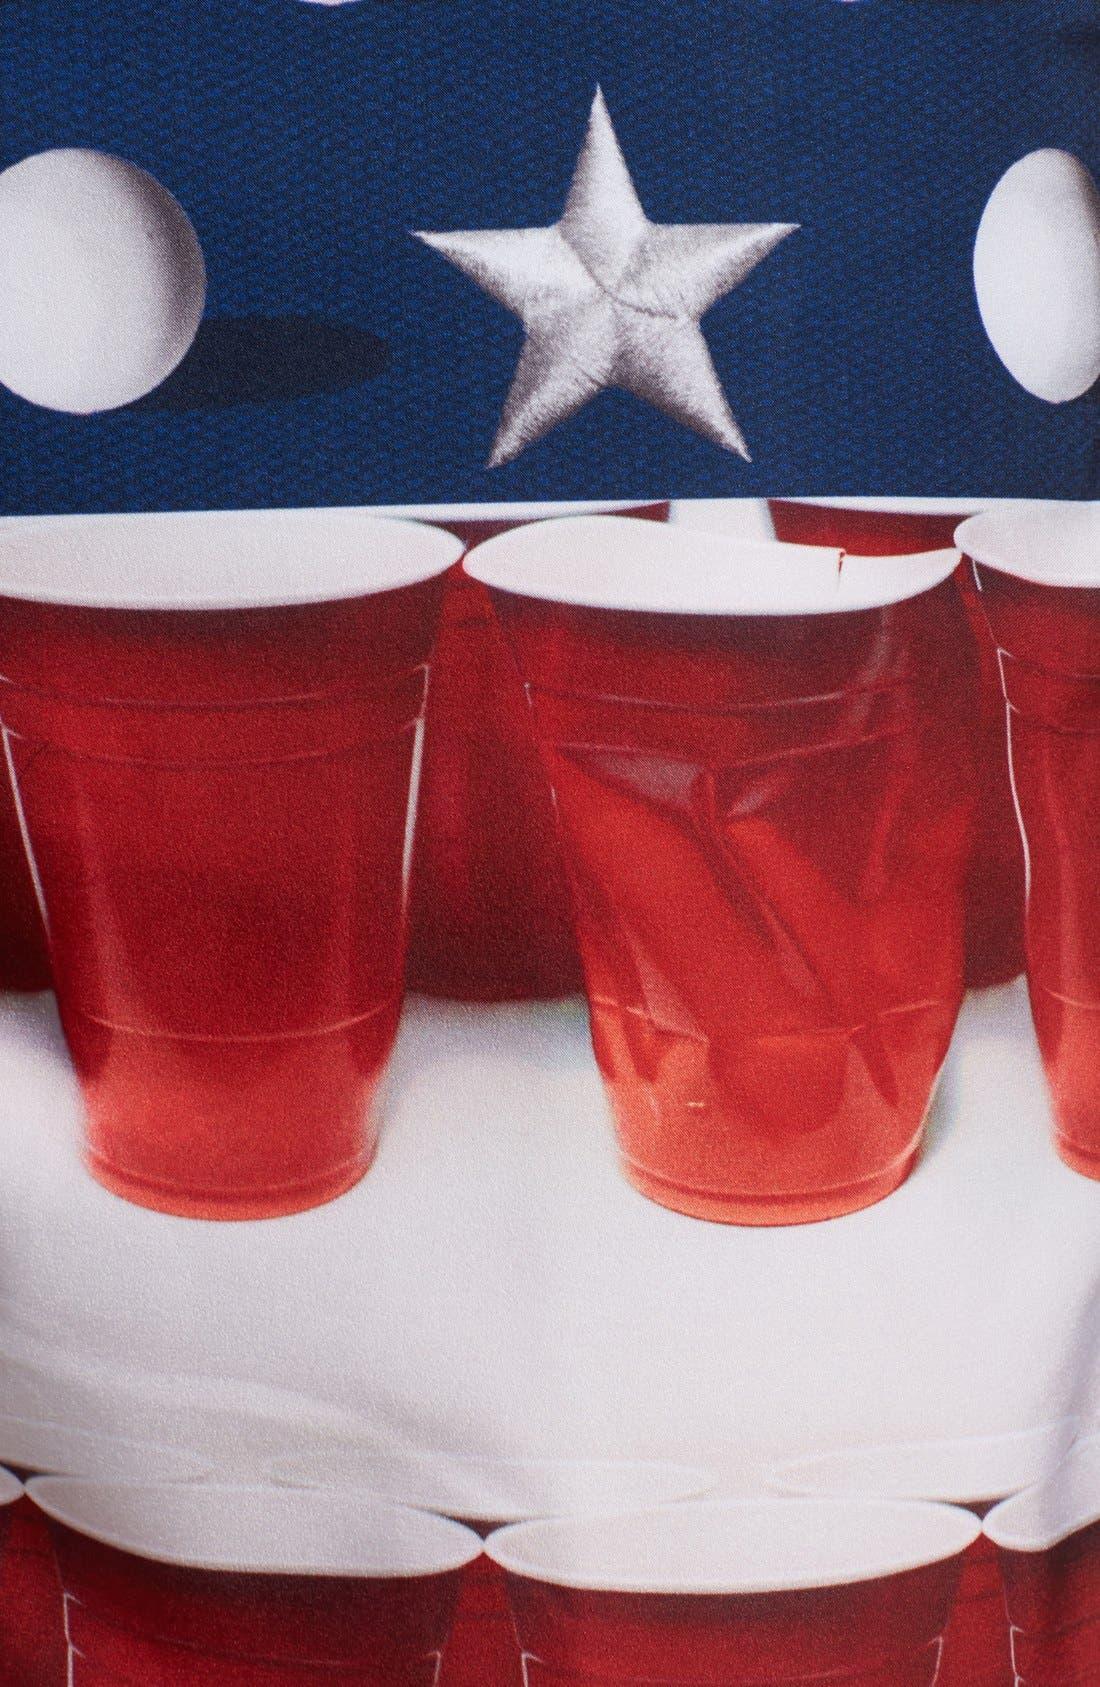 O'NEILL,                             'Hyperfreak - Beer Pong' Board Shorts,                             Alternate thumbnail 2, color,                             600